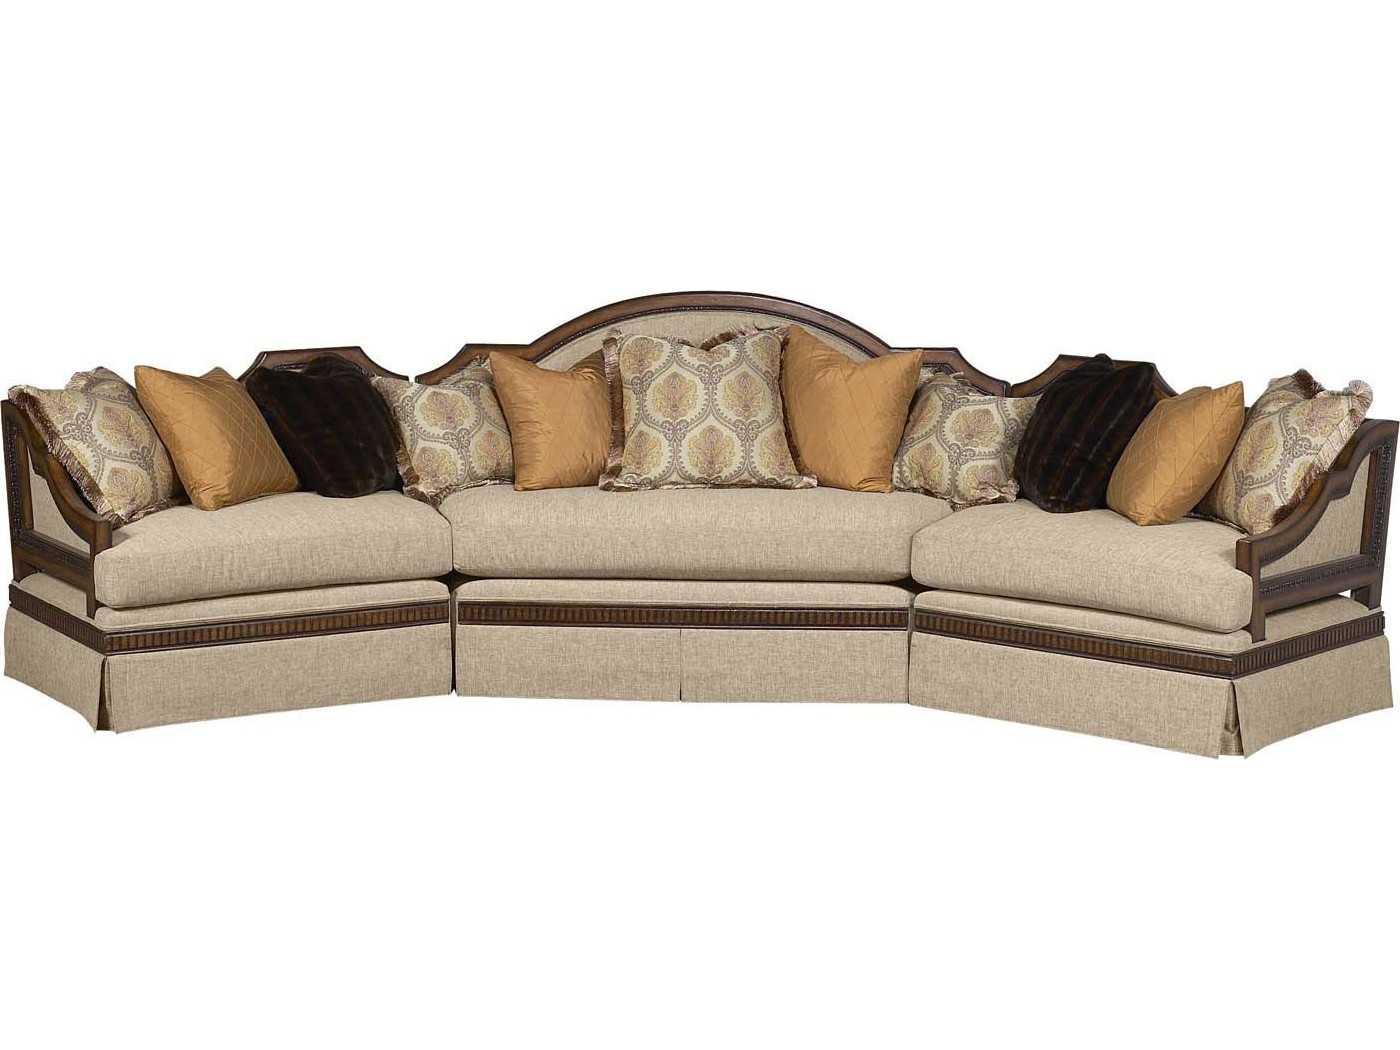 sabrina sofa natuzzi editions trieste 2 sectional leather reviews benetti 39s italia furniture three piece